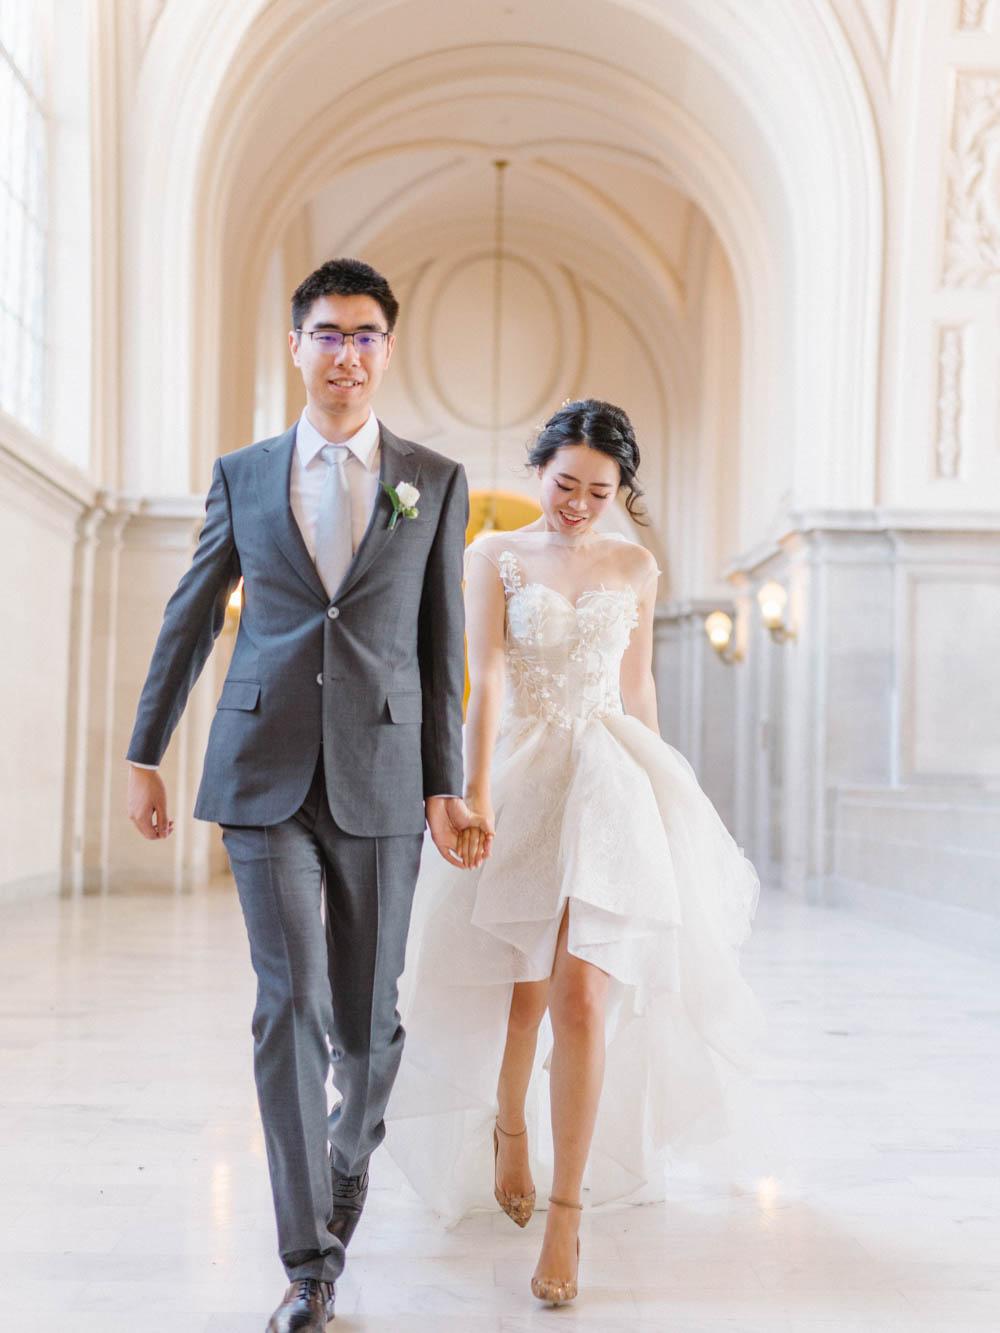 San Francisco Wedding Photographer - City Hall - Pinnel Photography-02911.jpg